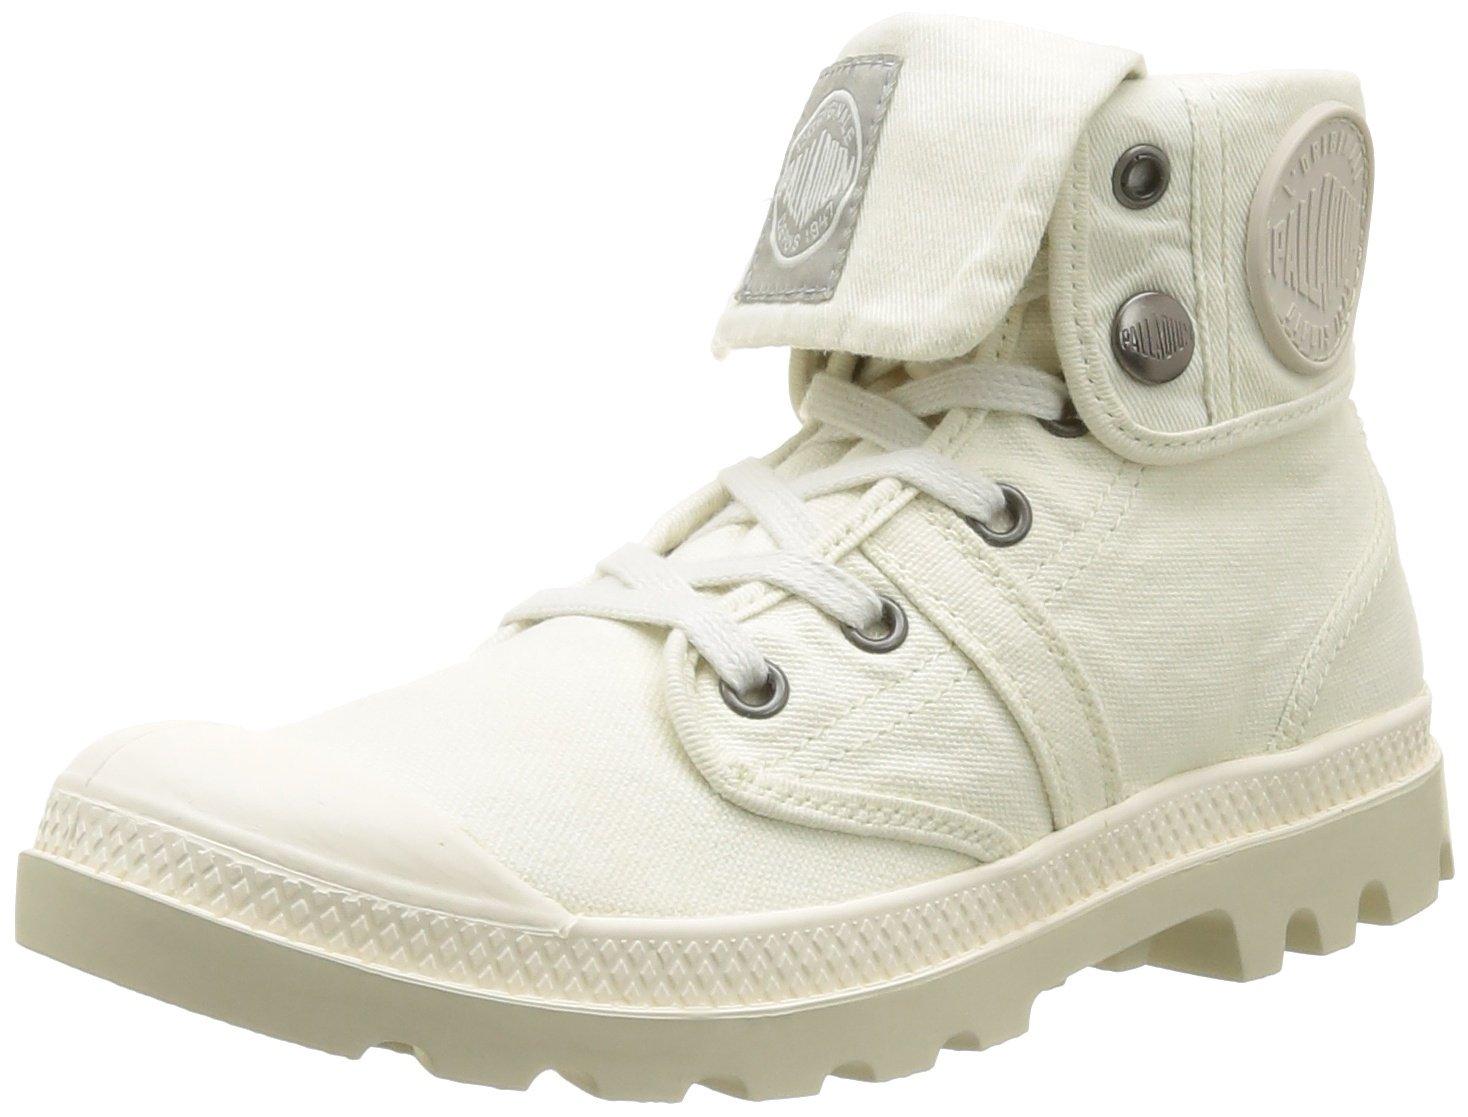 Palladium Baggy, (083 Boots Cream) femme Blanc Cassé Baggy, (083 Cream) a85a4c4 - automatisms.space